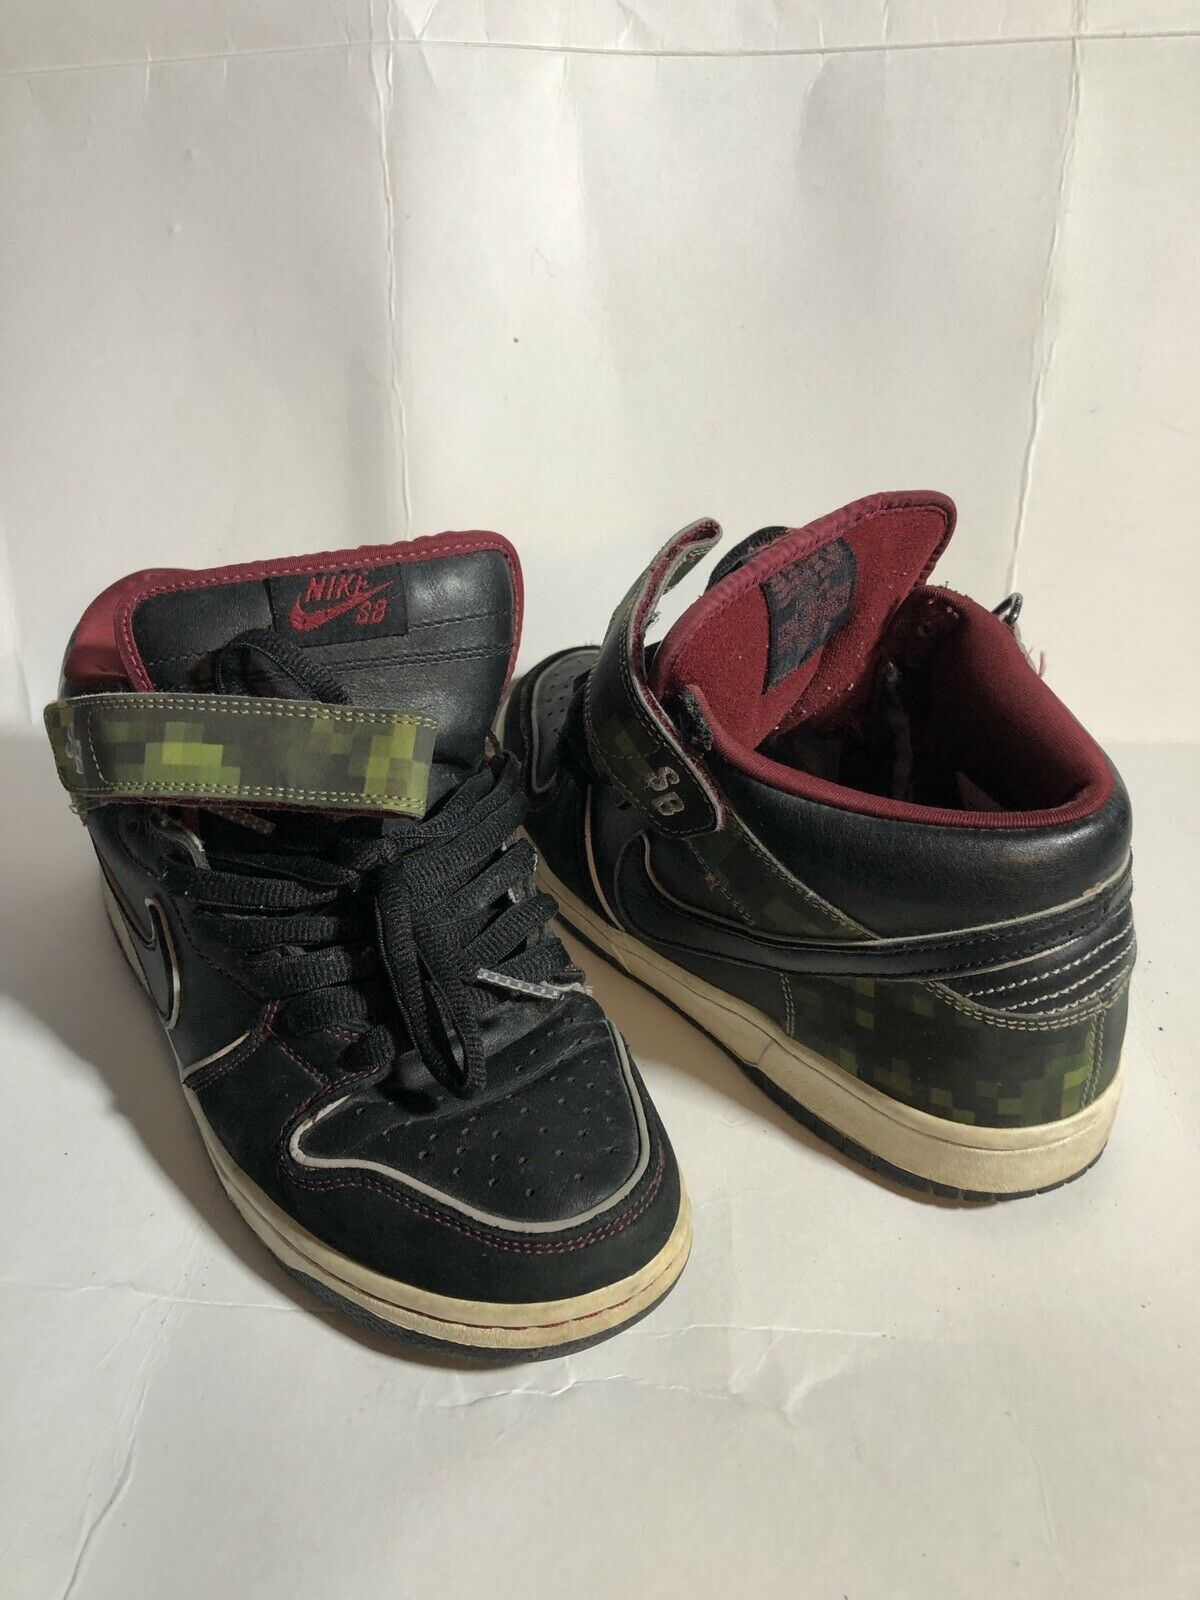 new styles c7c29 7580c Nike Sb Dunk Dunk Dunk Mid Nitrade Size 8 Tiff fc03e0